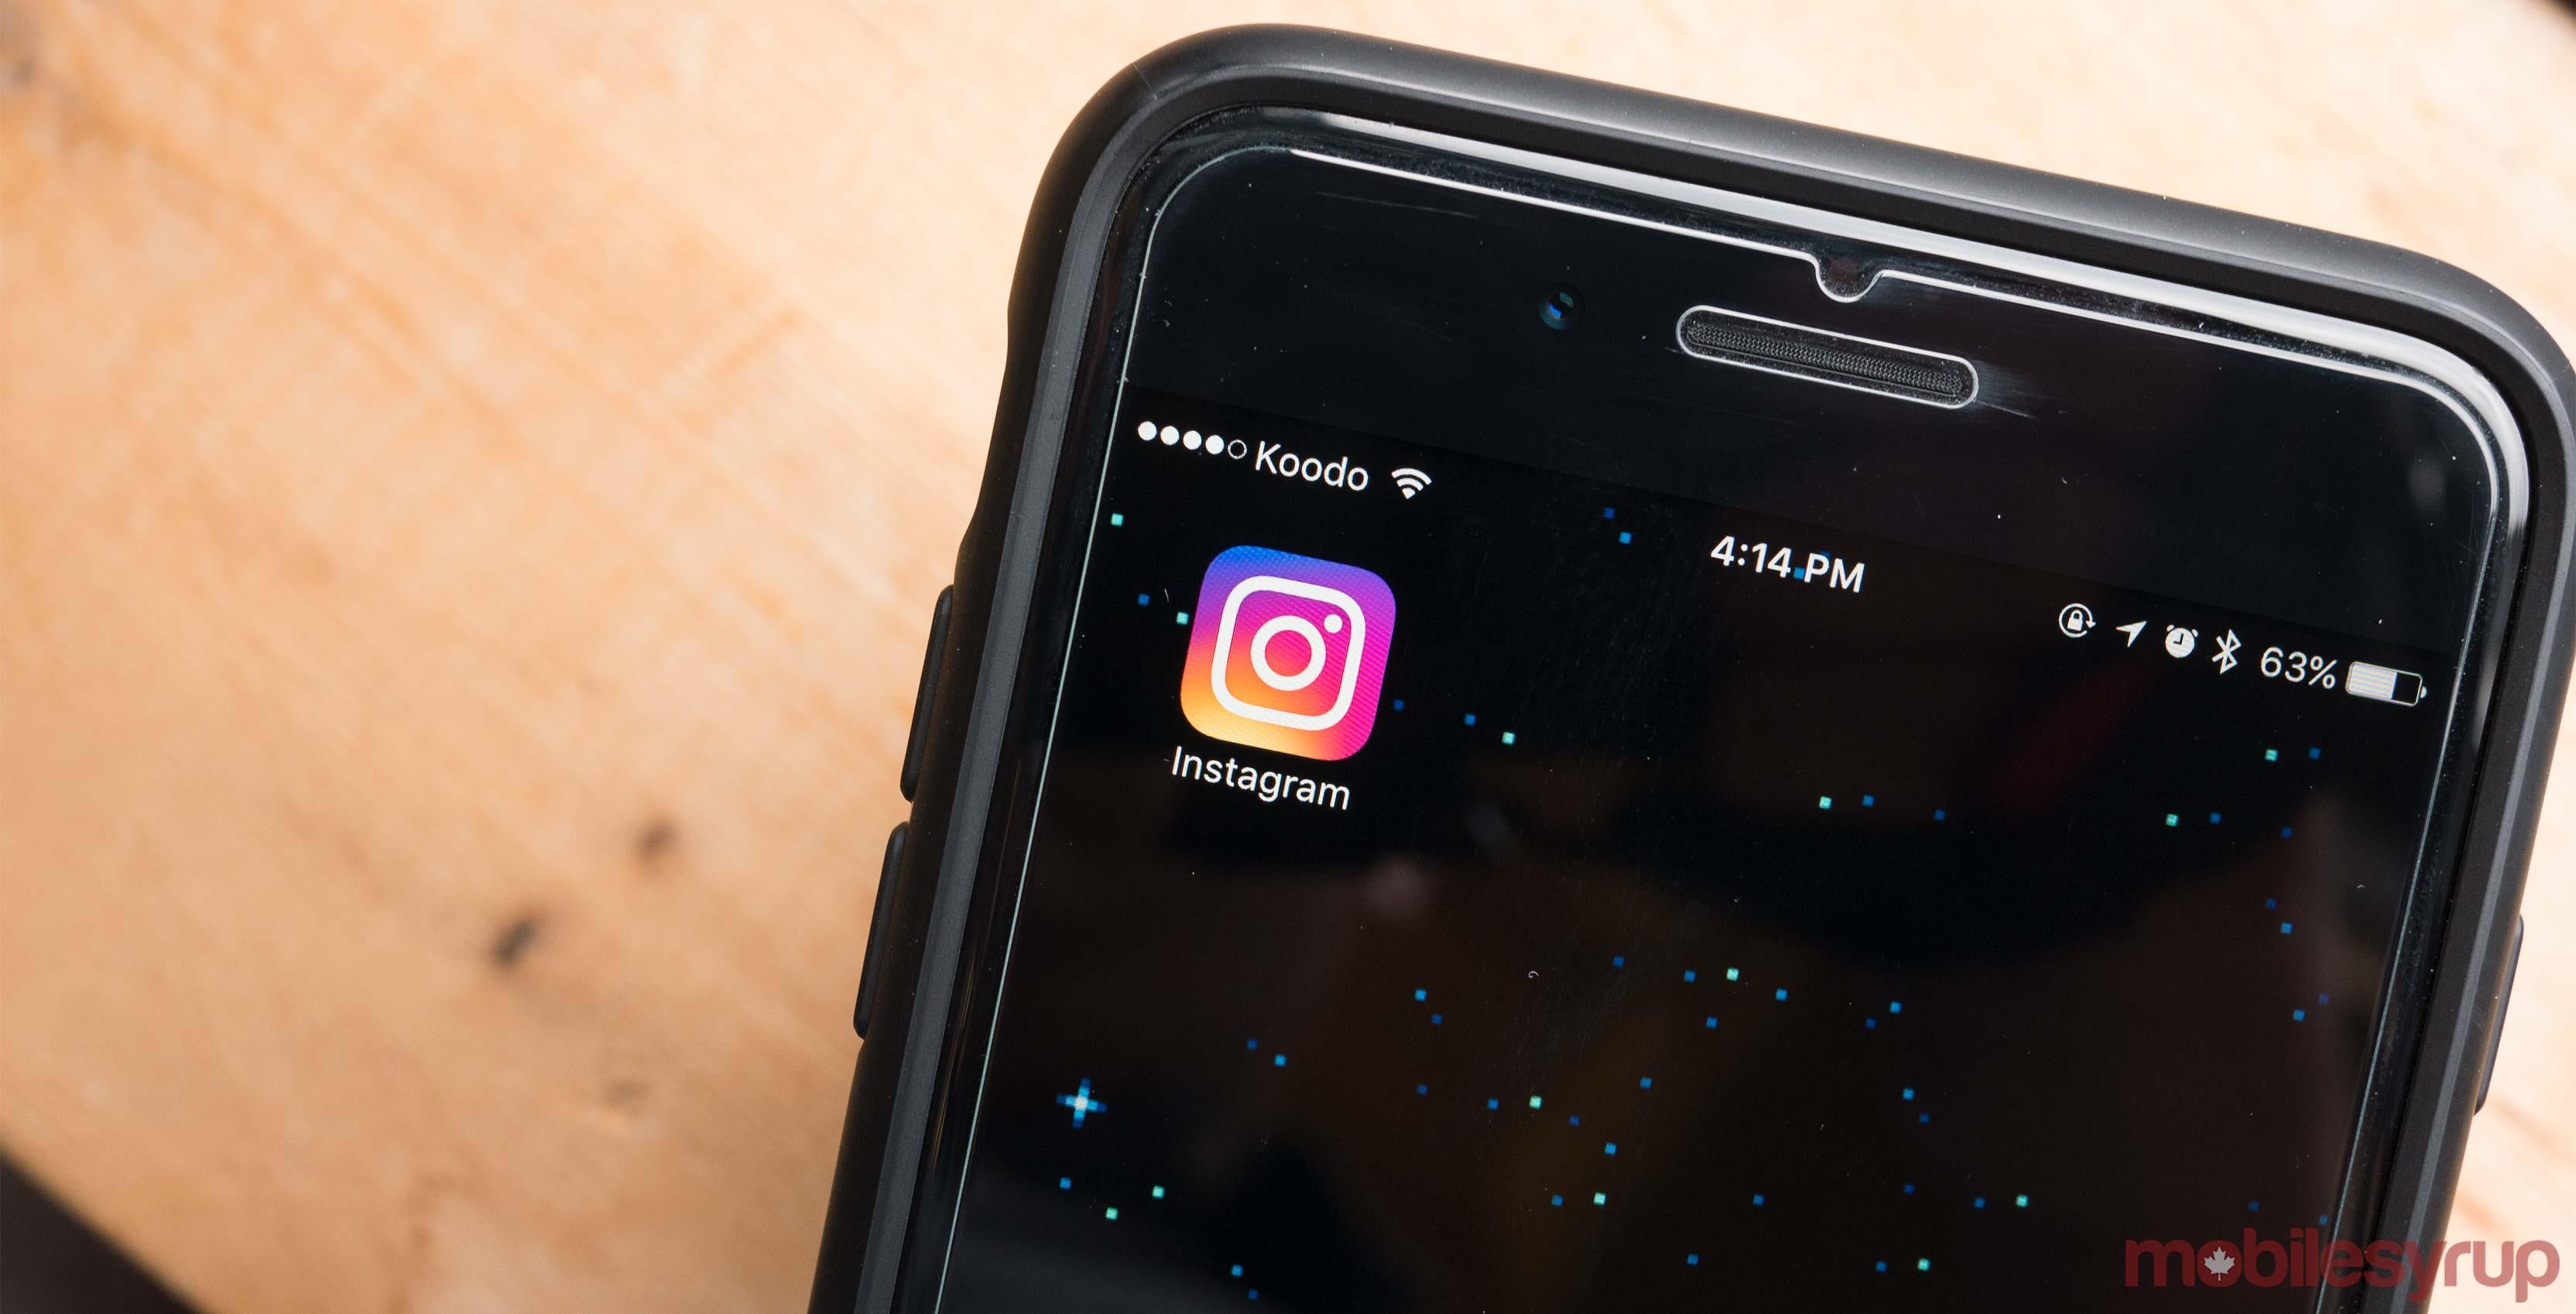 Instagram app on iOS